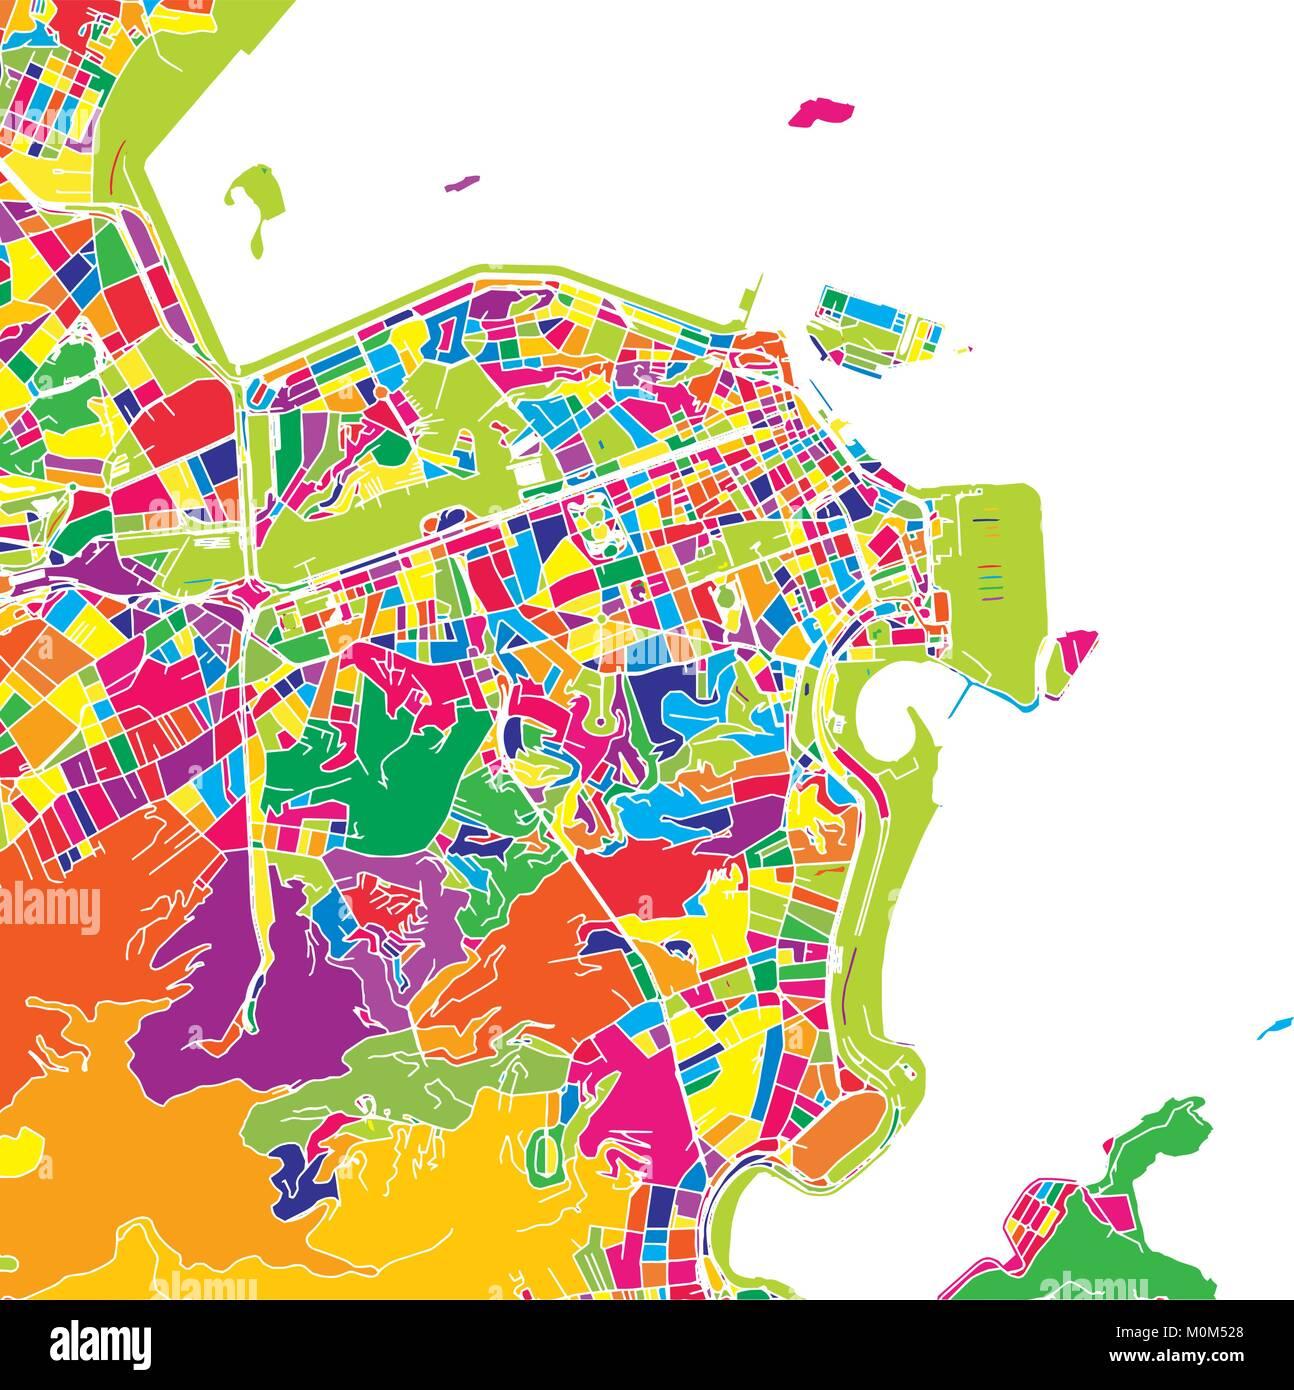 Rio de Janeiro, Brazil, colorful vector map. White streets, railways ...